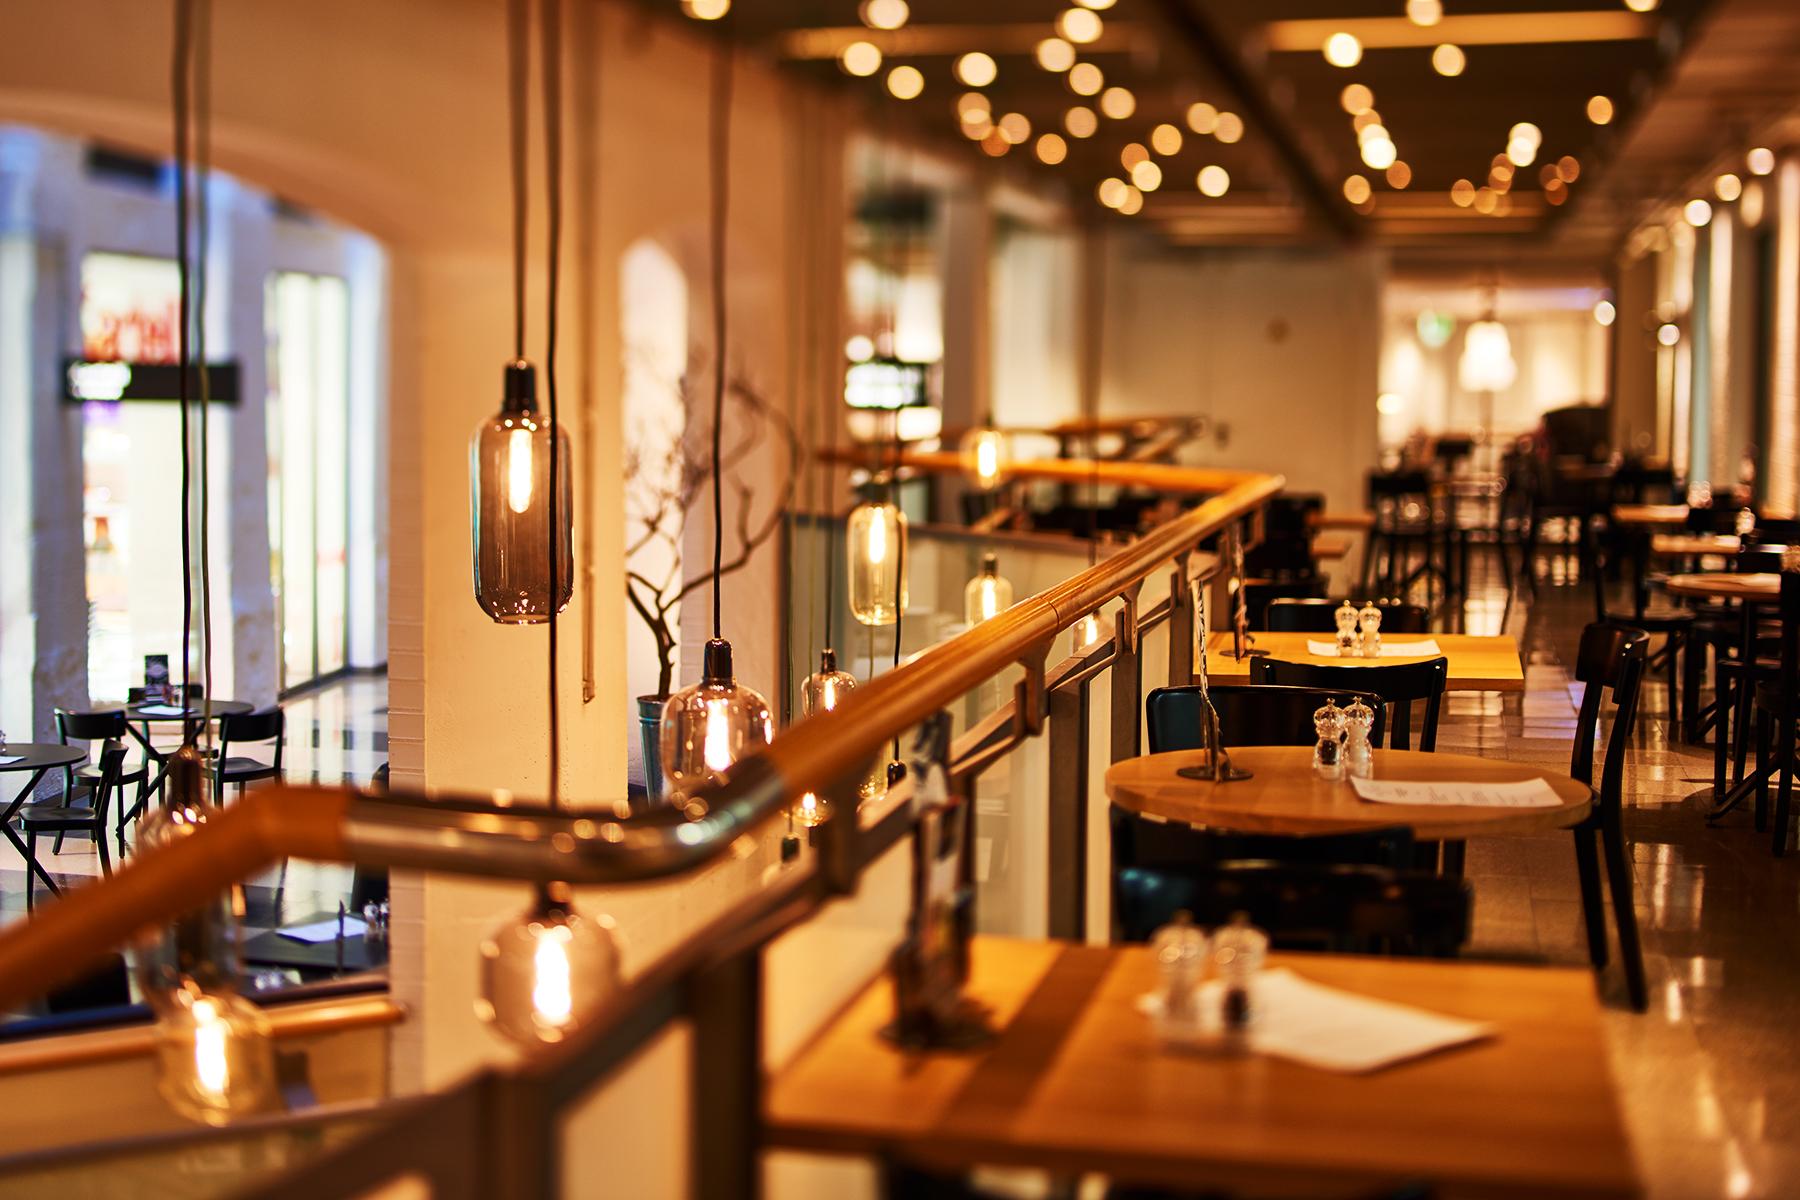 ber uns italienisches restaurant in hamburg ristorante vincenzo. Black Bedroom Furniture Sets. Home Design Ideas